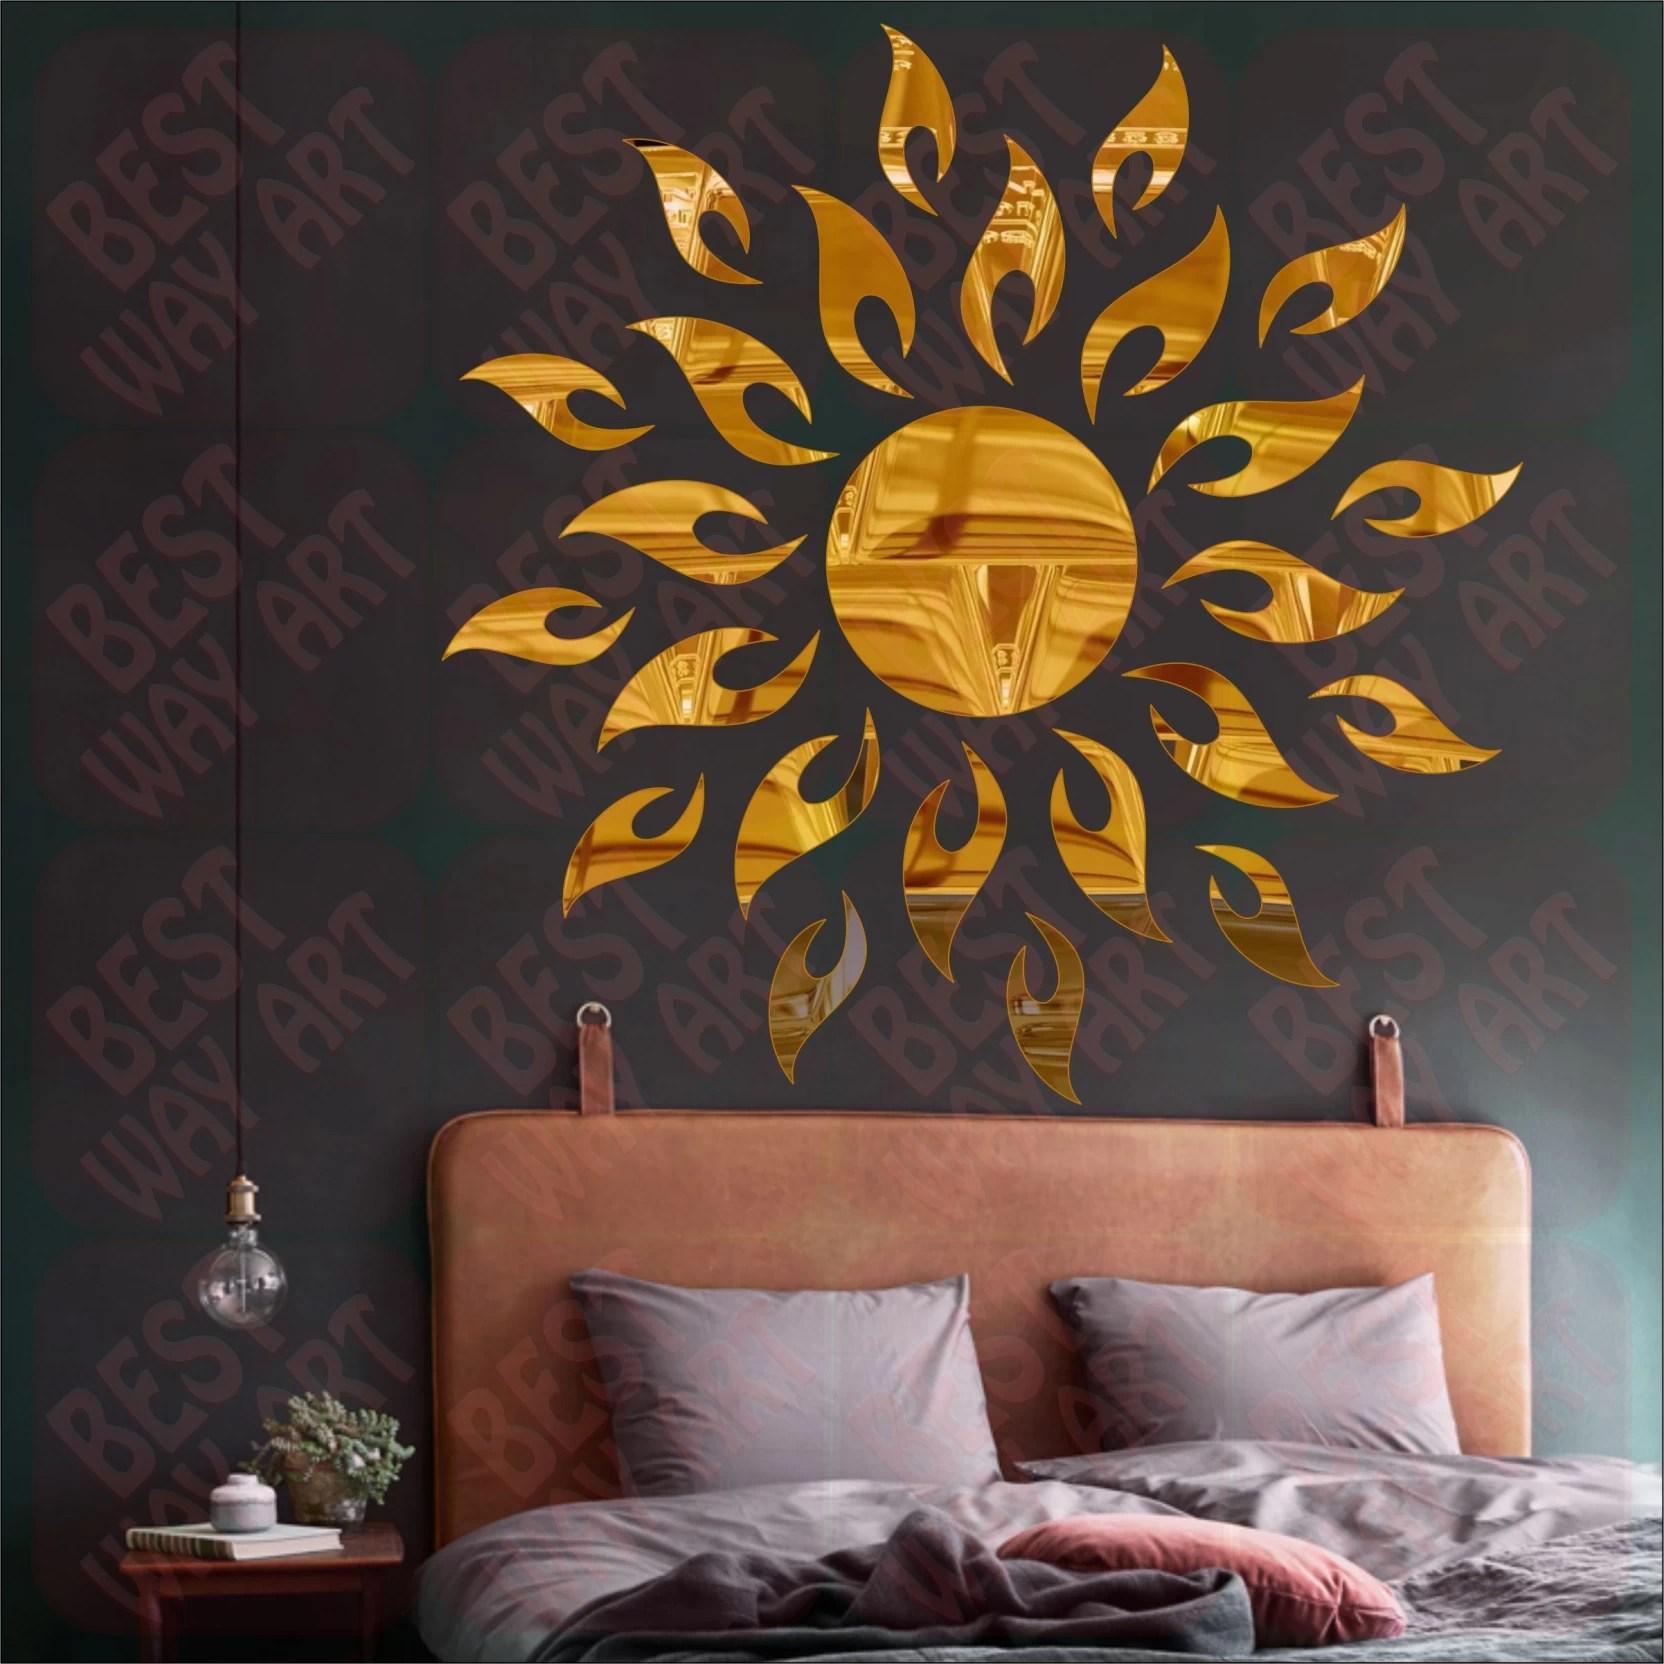 Best Decor Large Best Decor Sunface Sun Flame Golden Pack Of